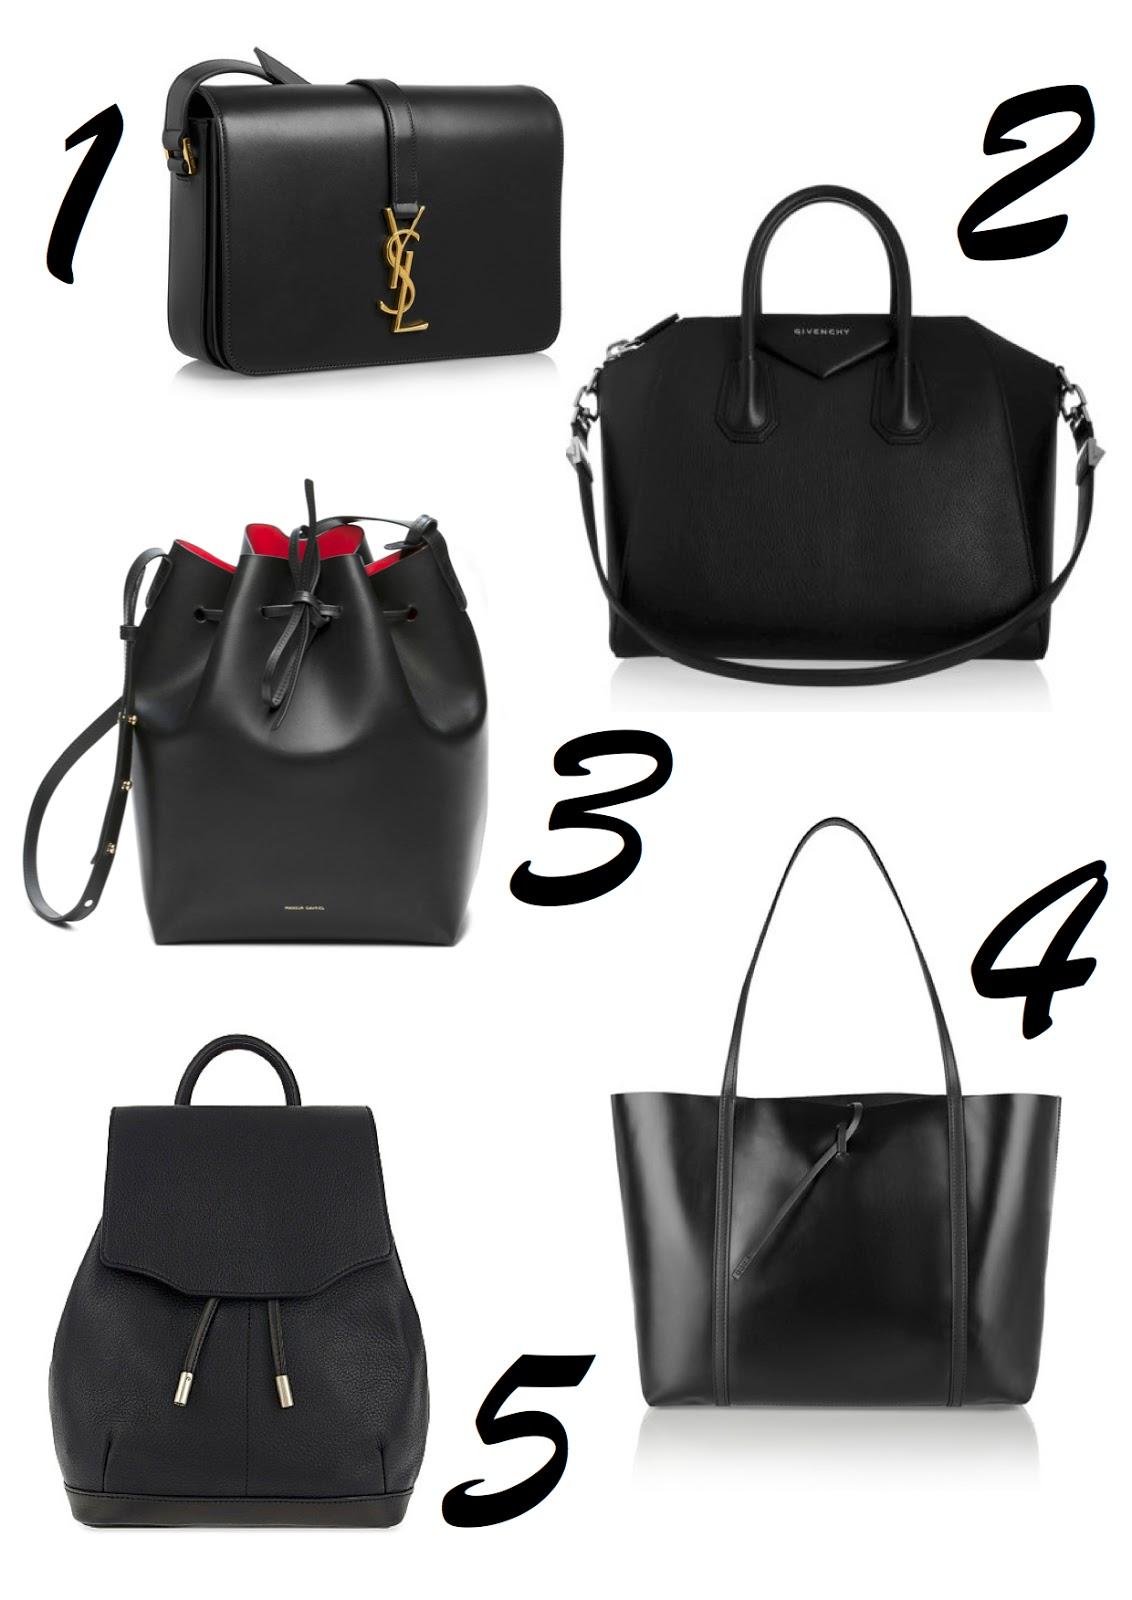 Givenchy Medium Antigona Bag 1 465 3 Mansur Gavriel Bucket 485 4 Kara Tie Leather Tote 365 5 Rag Bone Mini Pilot Backpack 480